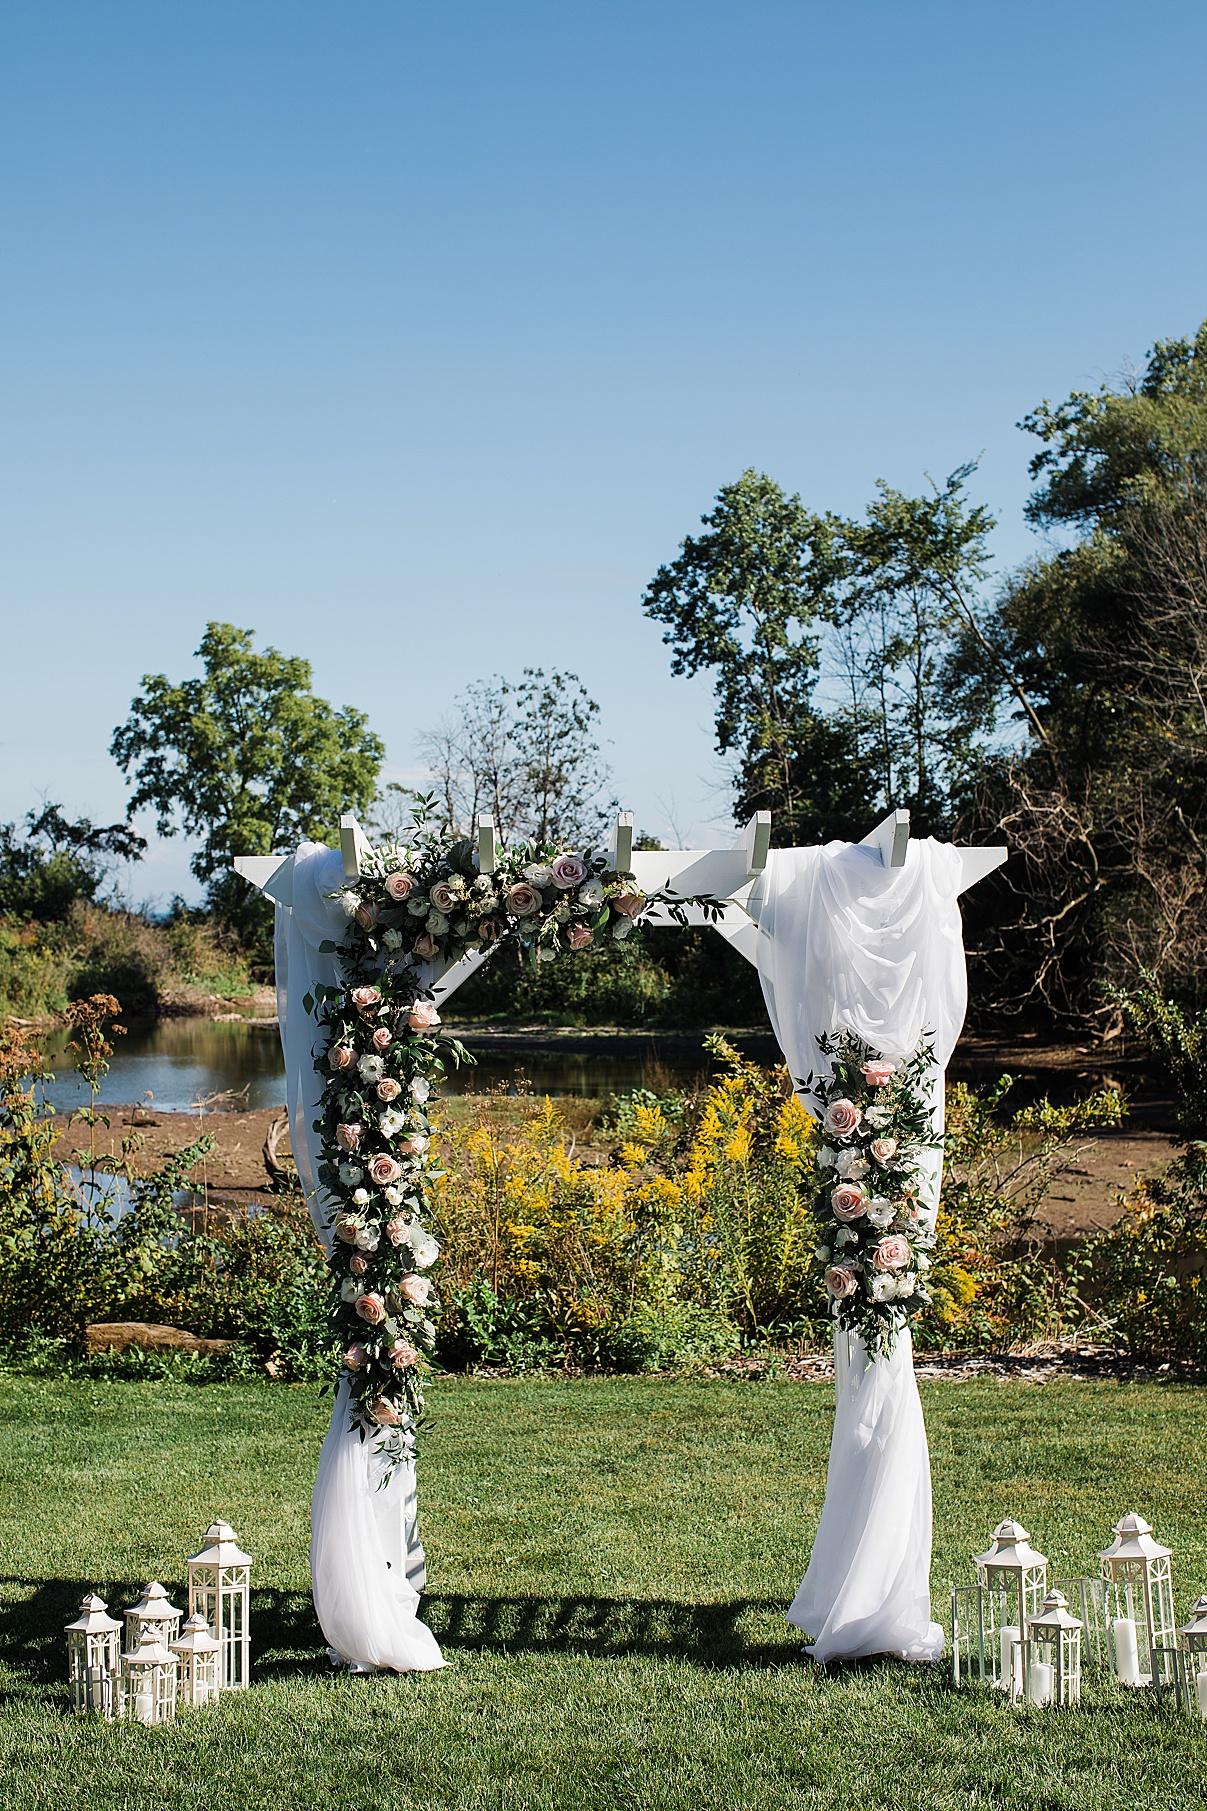 Floral wedding arch| Harding Waterfront Estate Wedding| Ontario wedding photographer| Toronto wedding photographer| 3 Photography | 3photography.ca